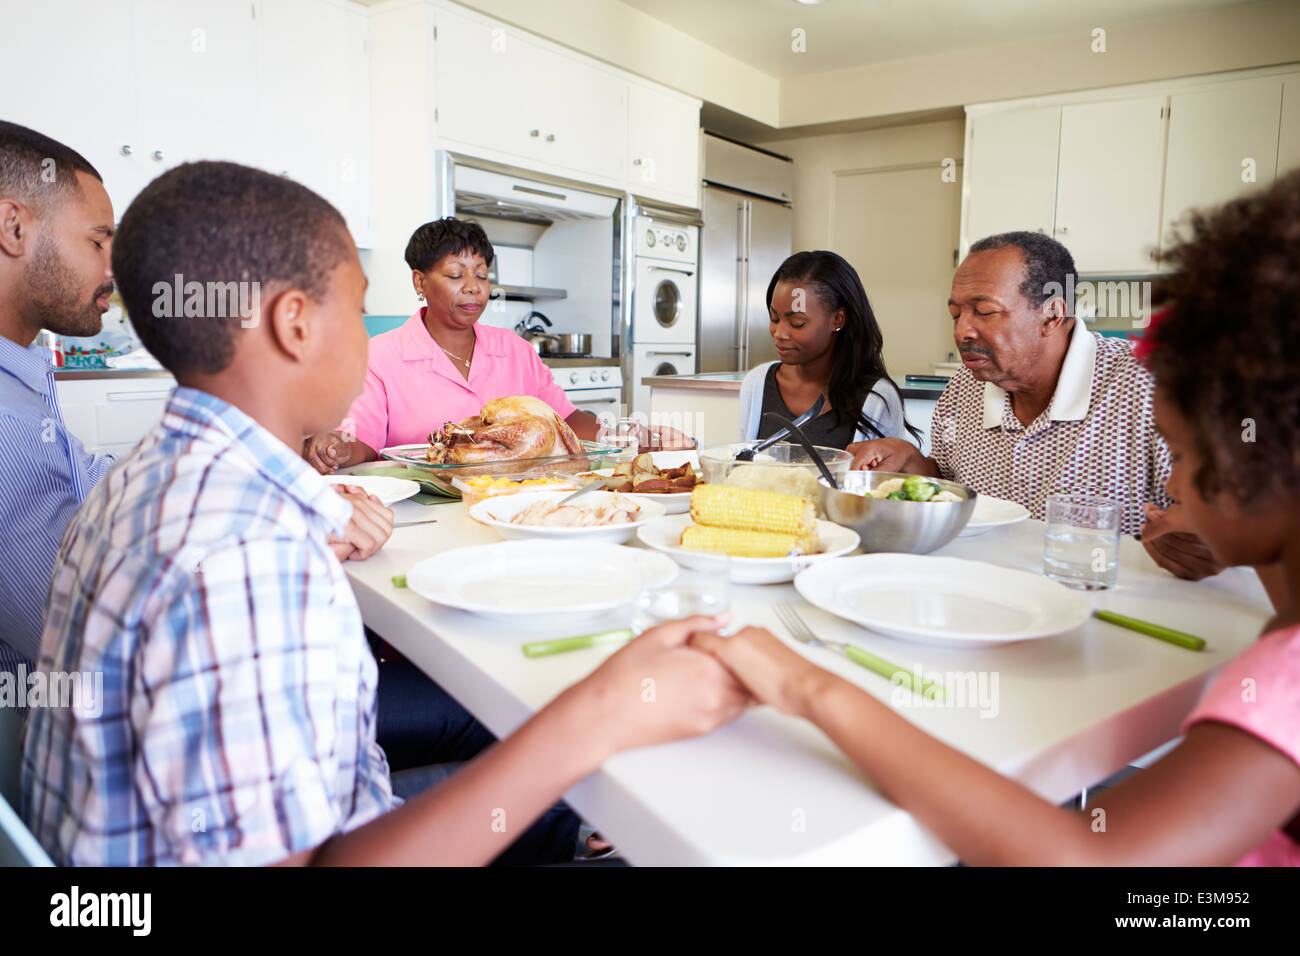 Multi-Generation Family Saying Prayer Before Eating Meal - Stock Image